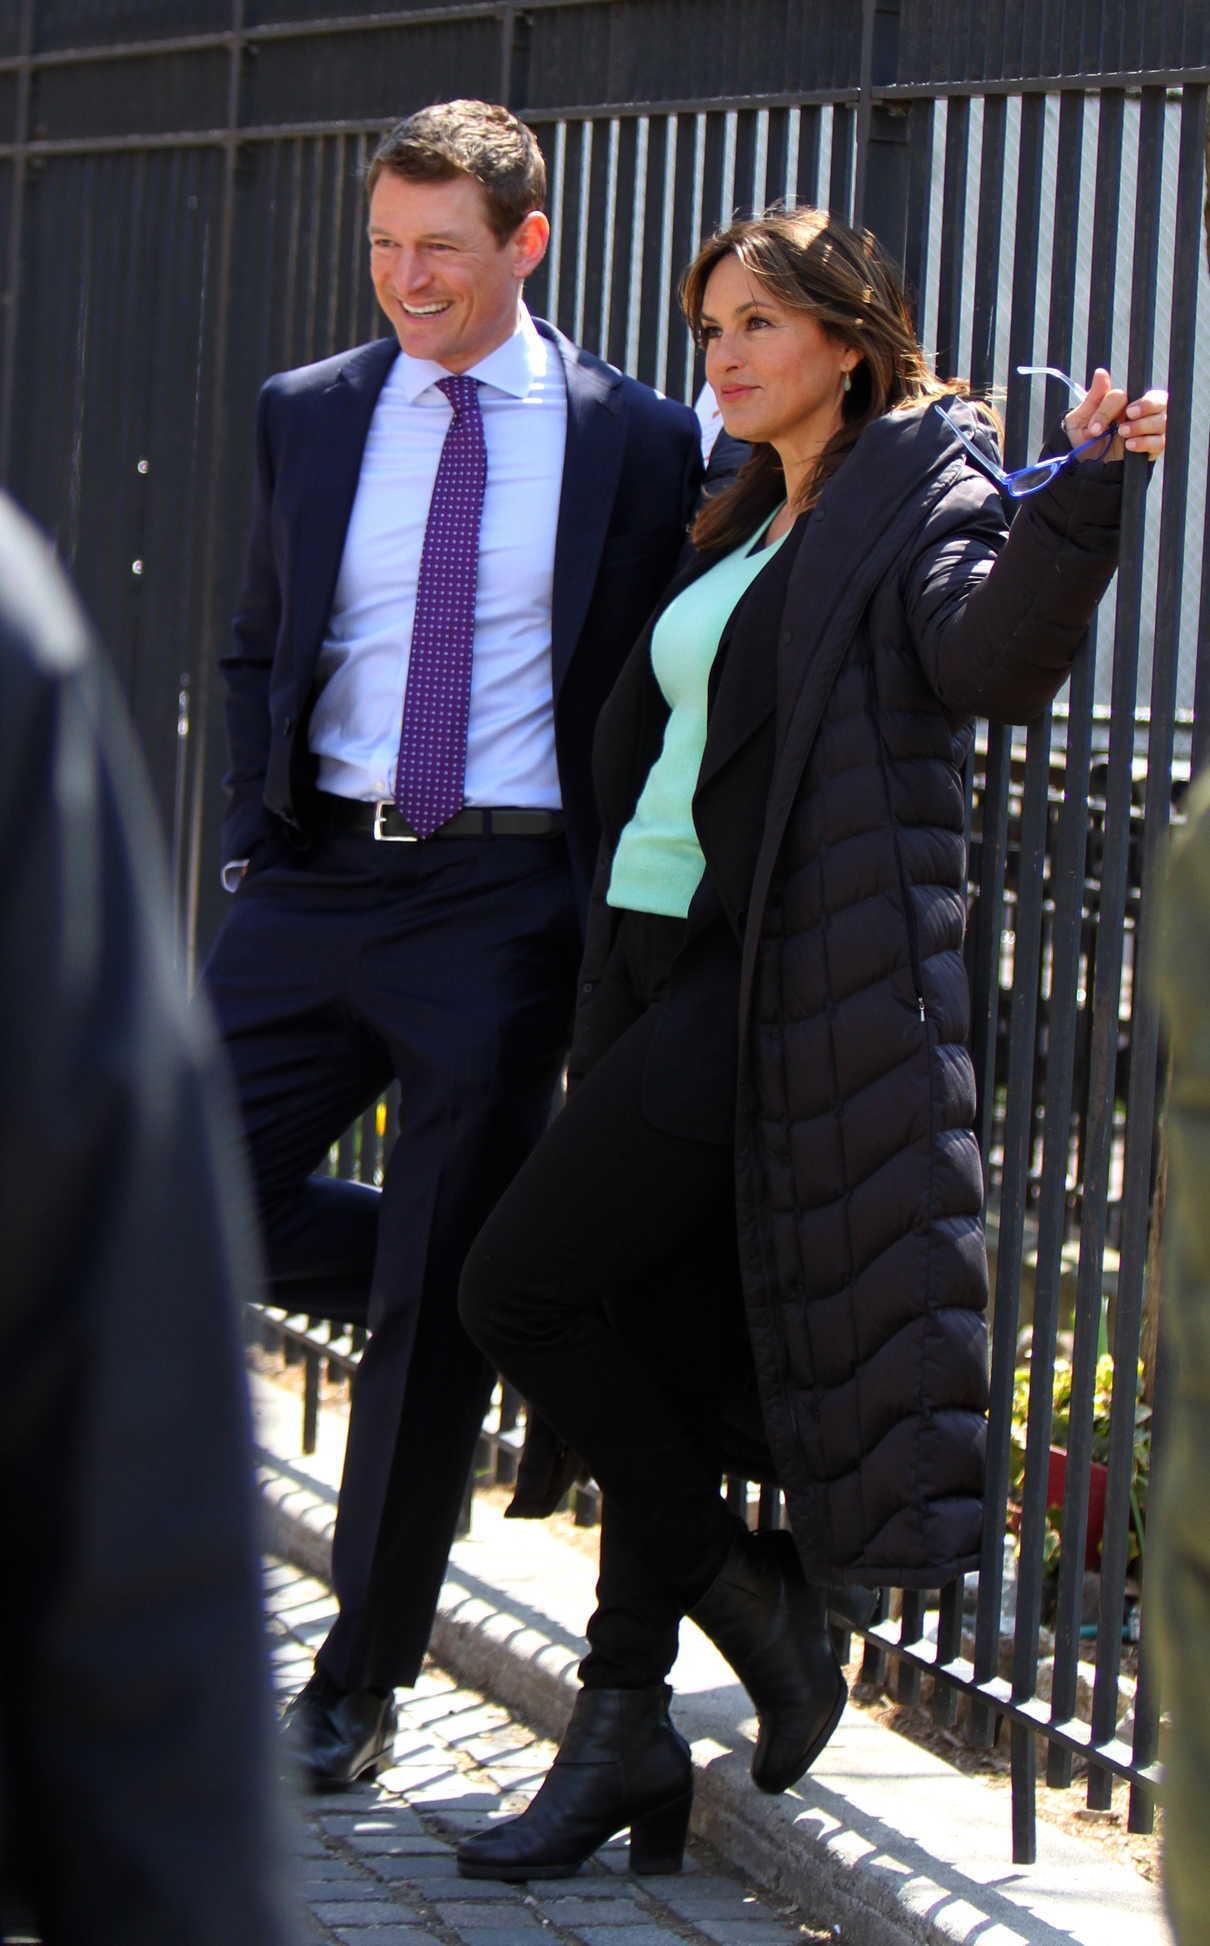 Mariska Hargitay on the Set of Law and Order: SVU in NYC 04/11/2018-5